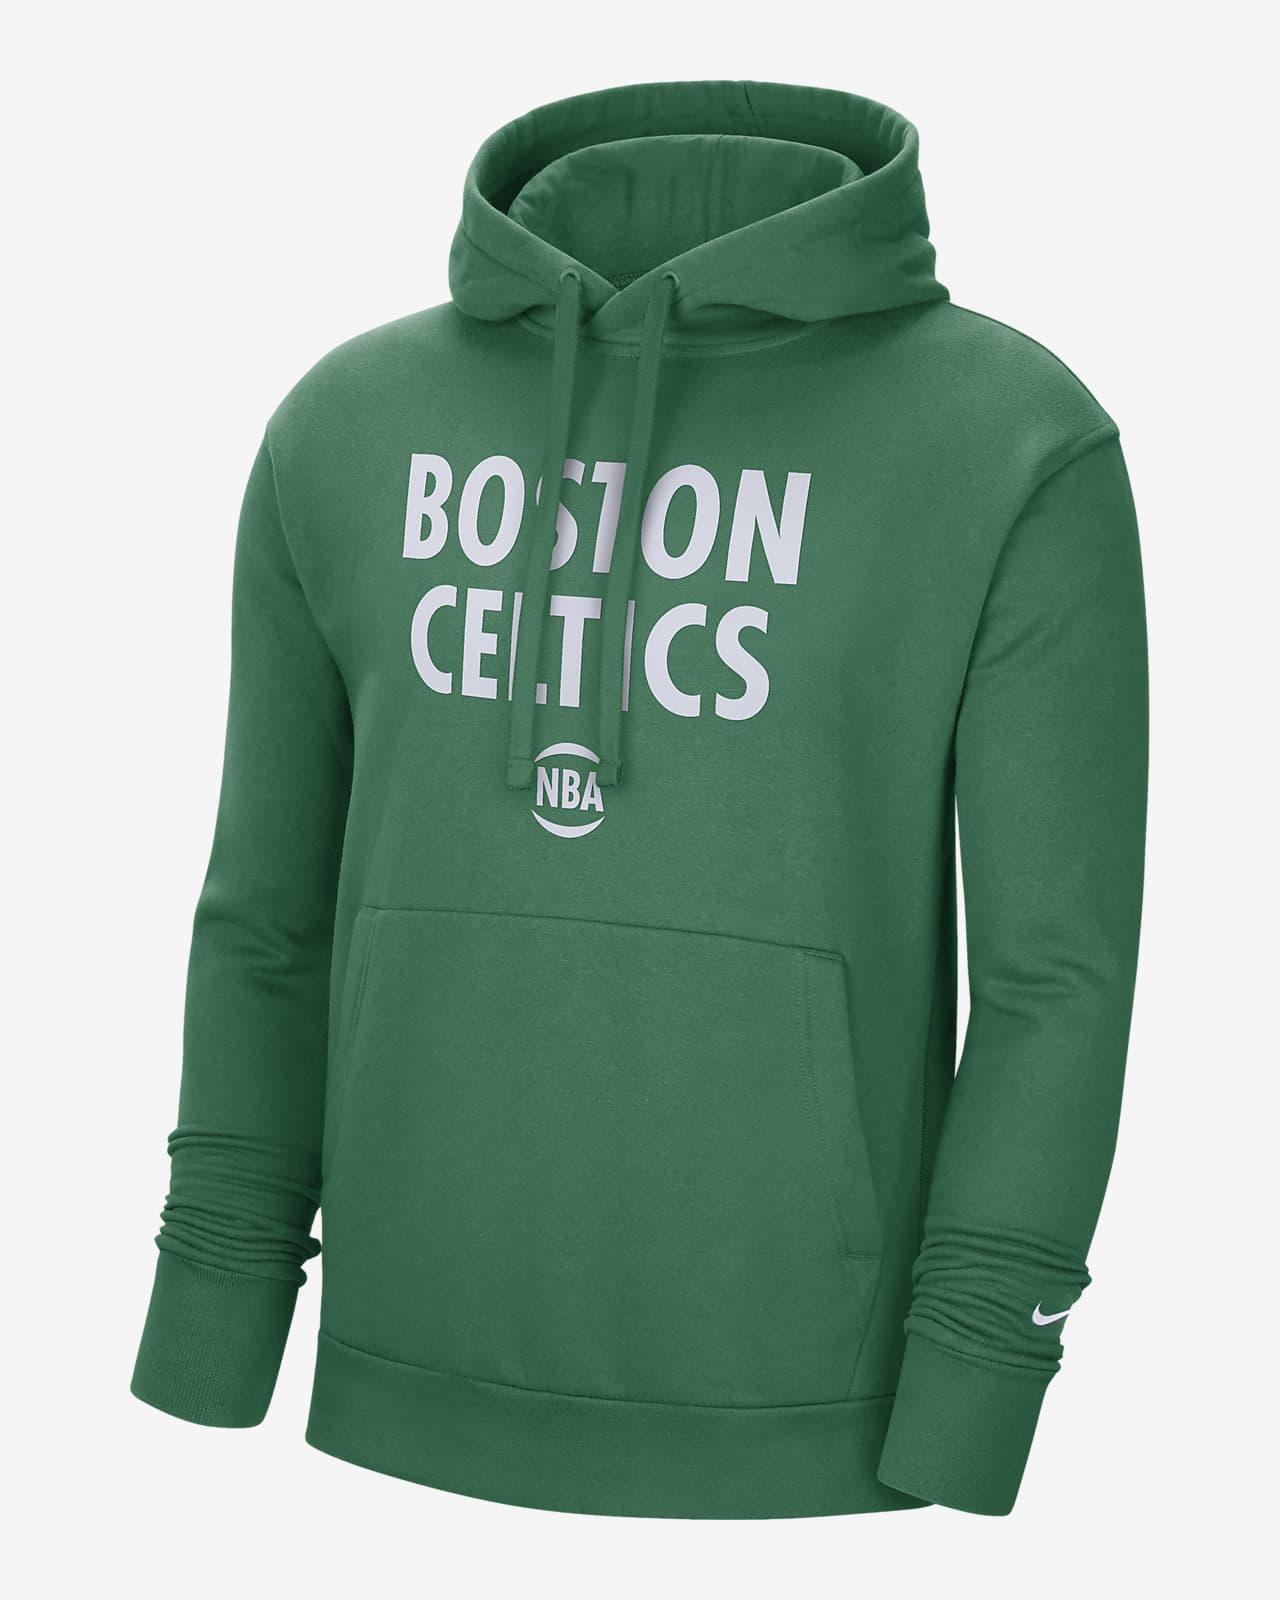 Boston Celtics City Edition Logo Nike NBA-s belebújós, kapucnis férfipulóver